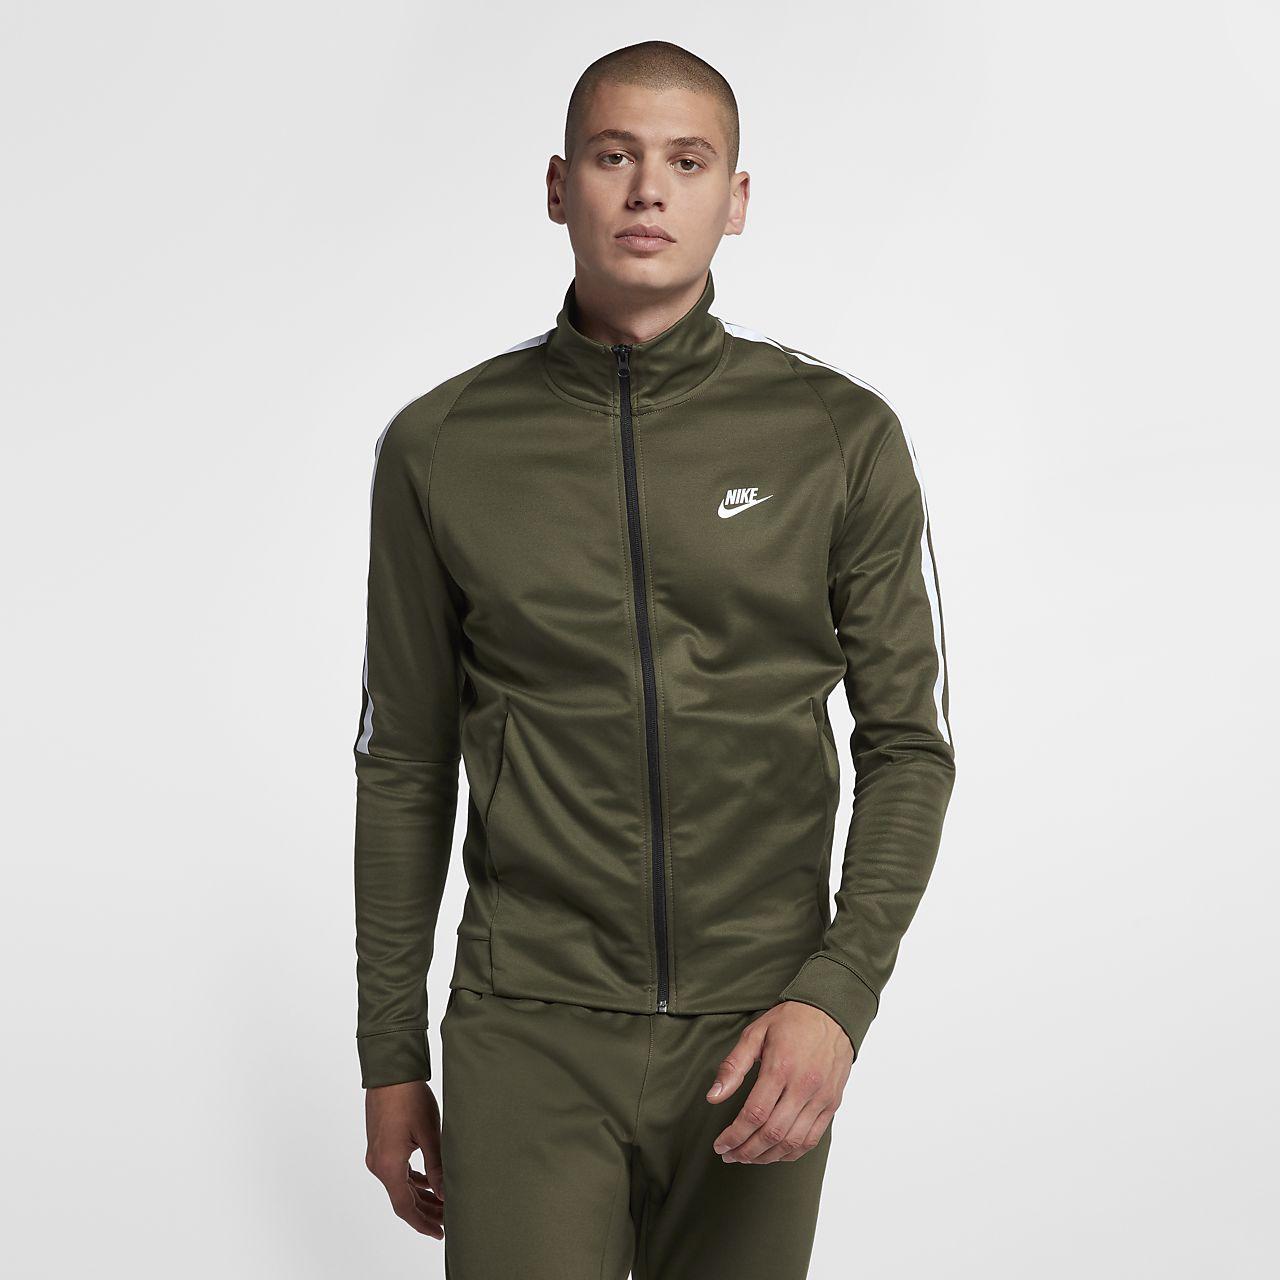 ff3b5903fdf6 ... Nike sportswear n98 men s jacket. Free shipping